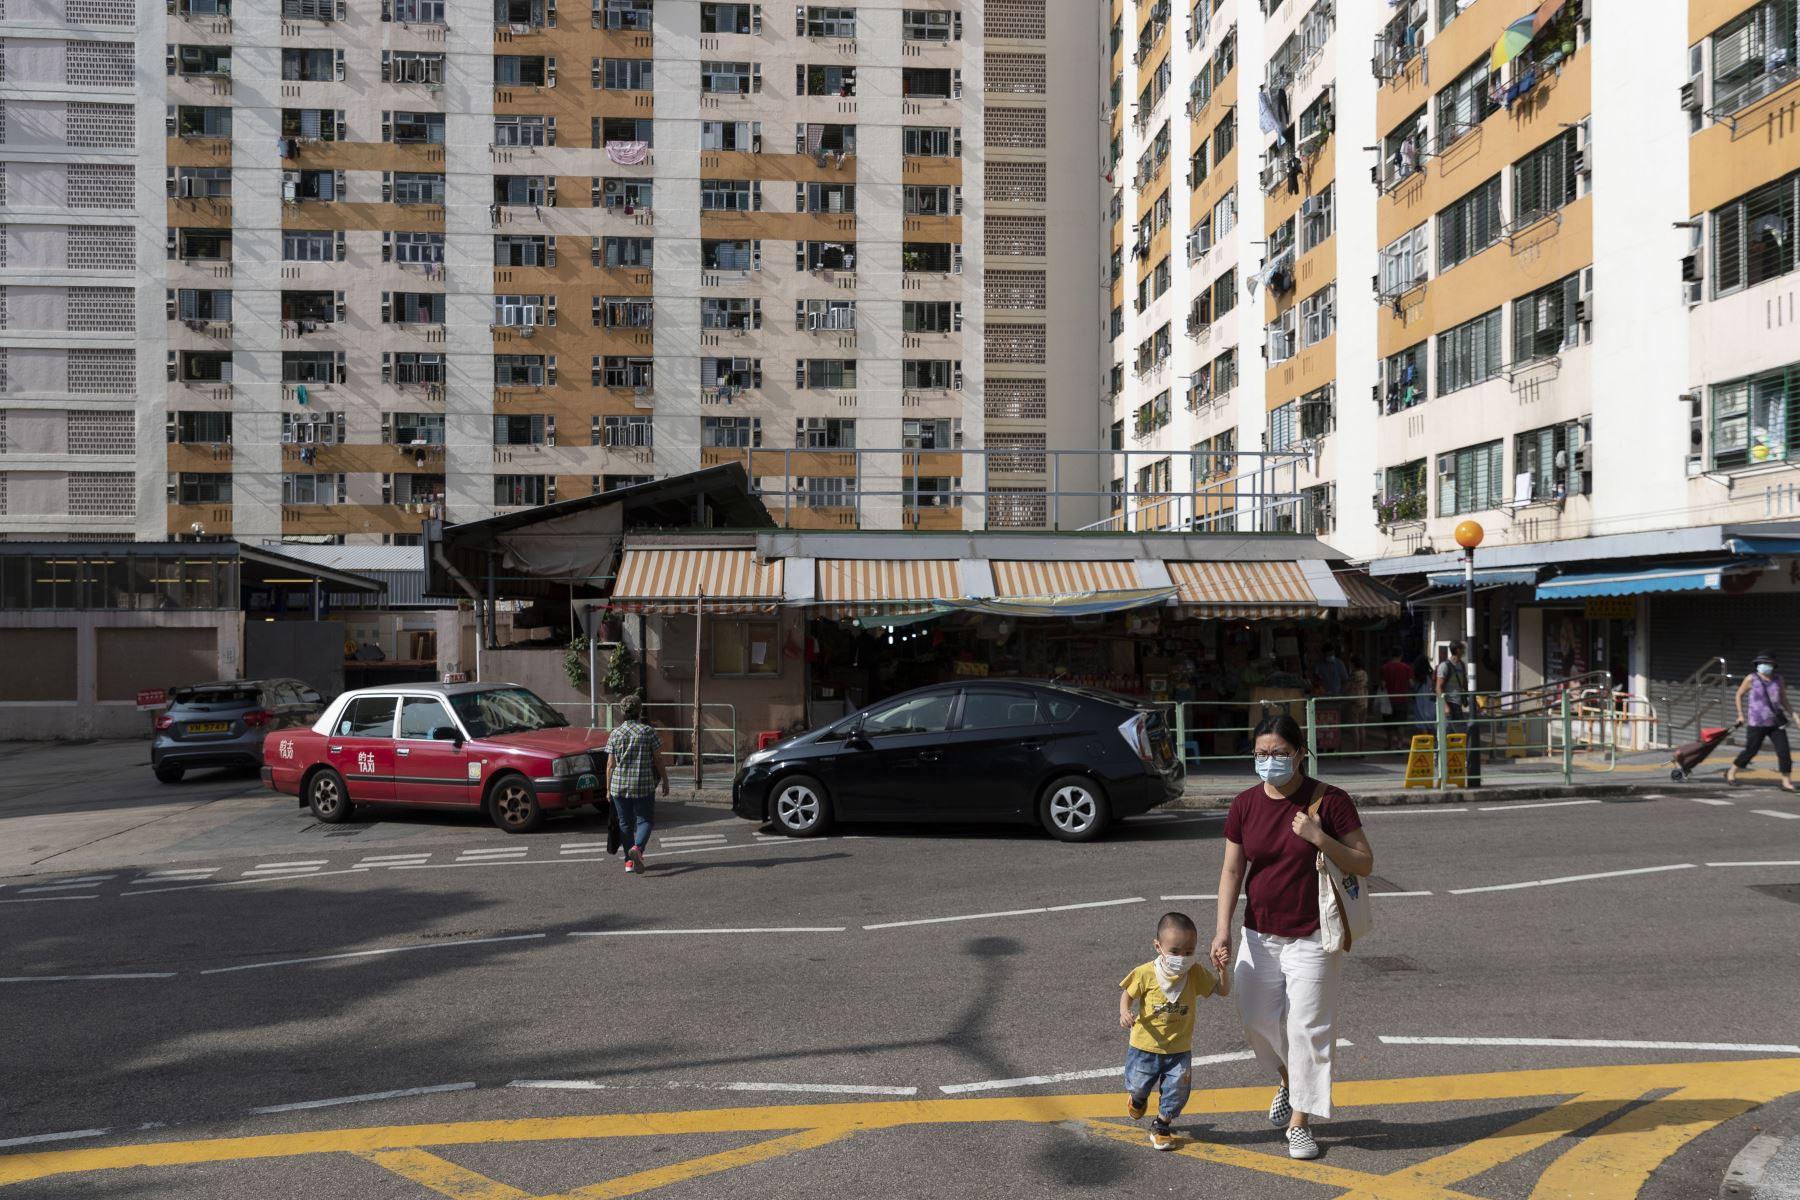 Personas continúan usando mascarillas como medida de precaución contra el coronavirus, en Hong Kong. Foto: AFP